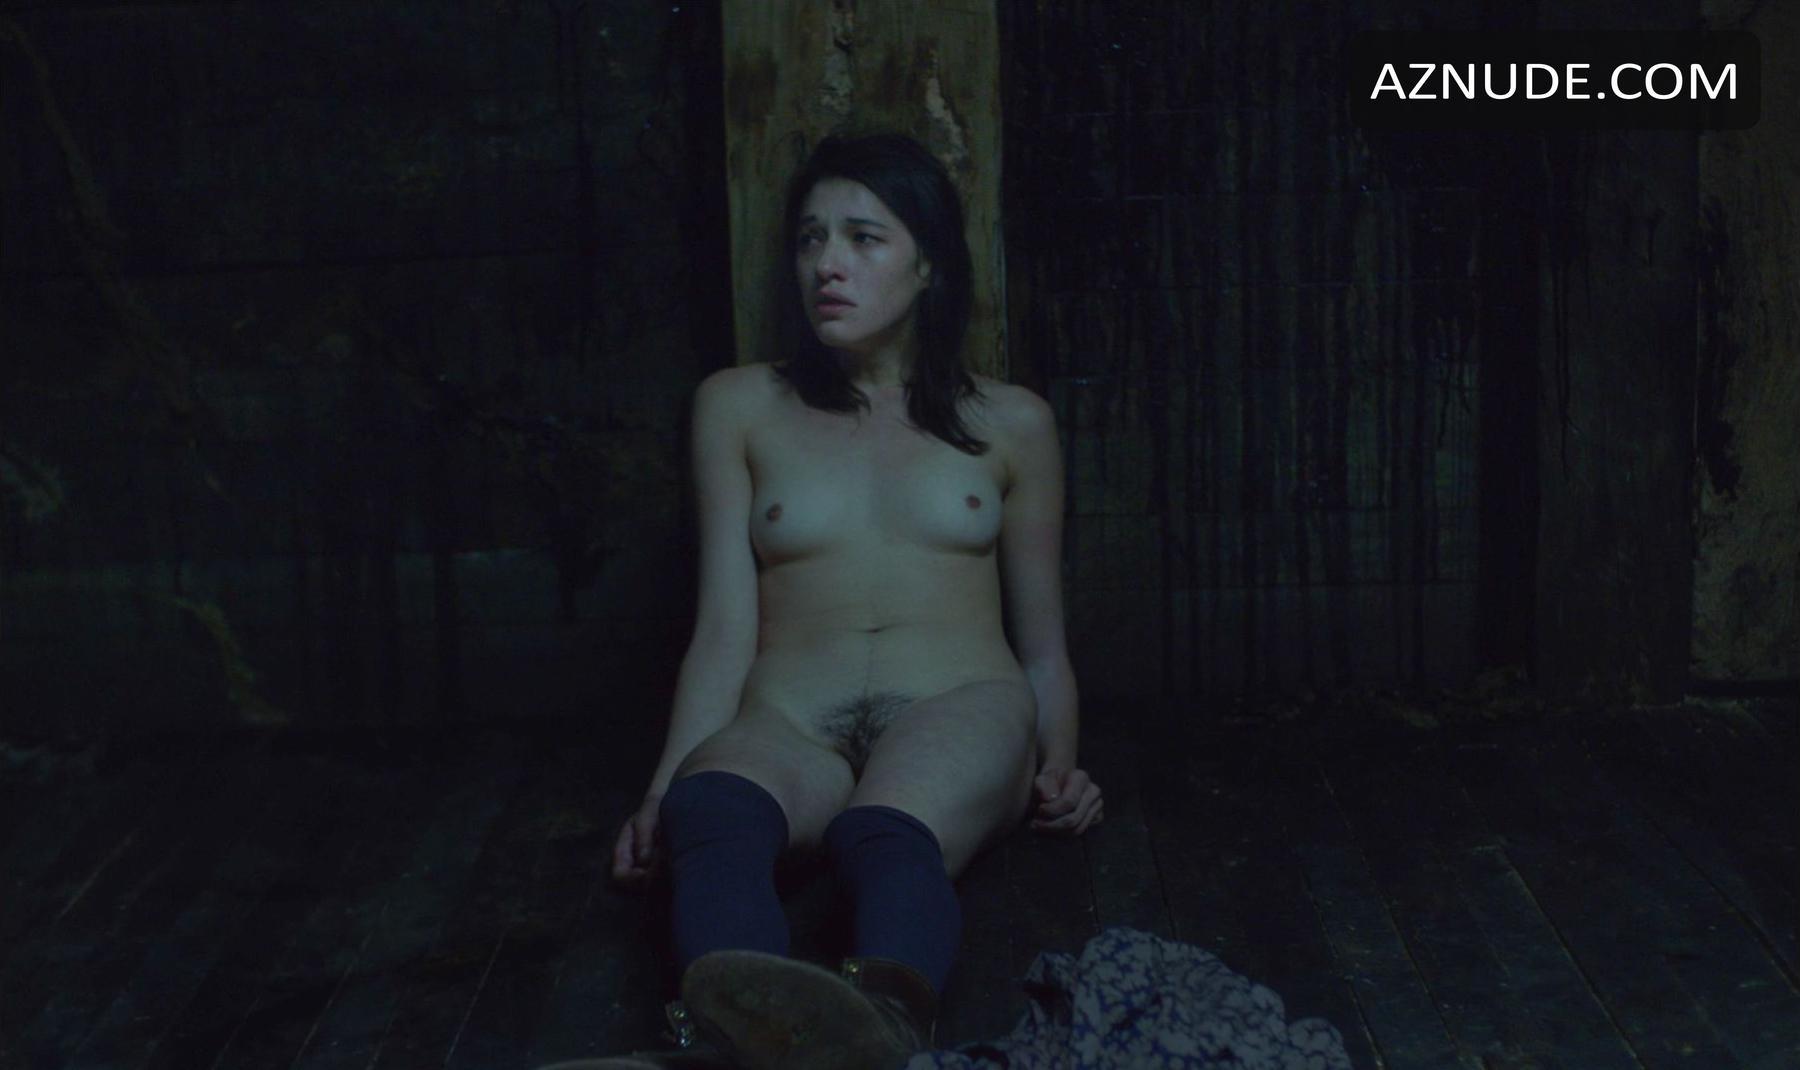 Ruth ramos nude sex with a creature oandalplanetcomn sc - 2 7